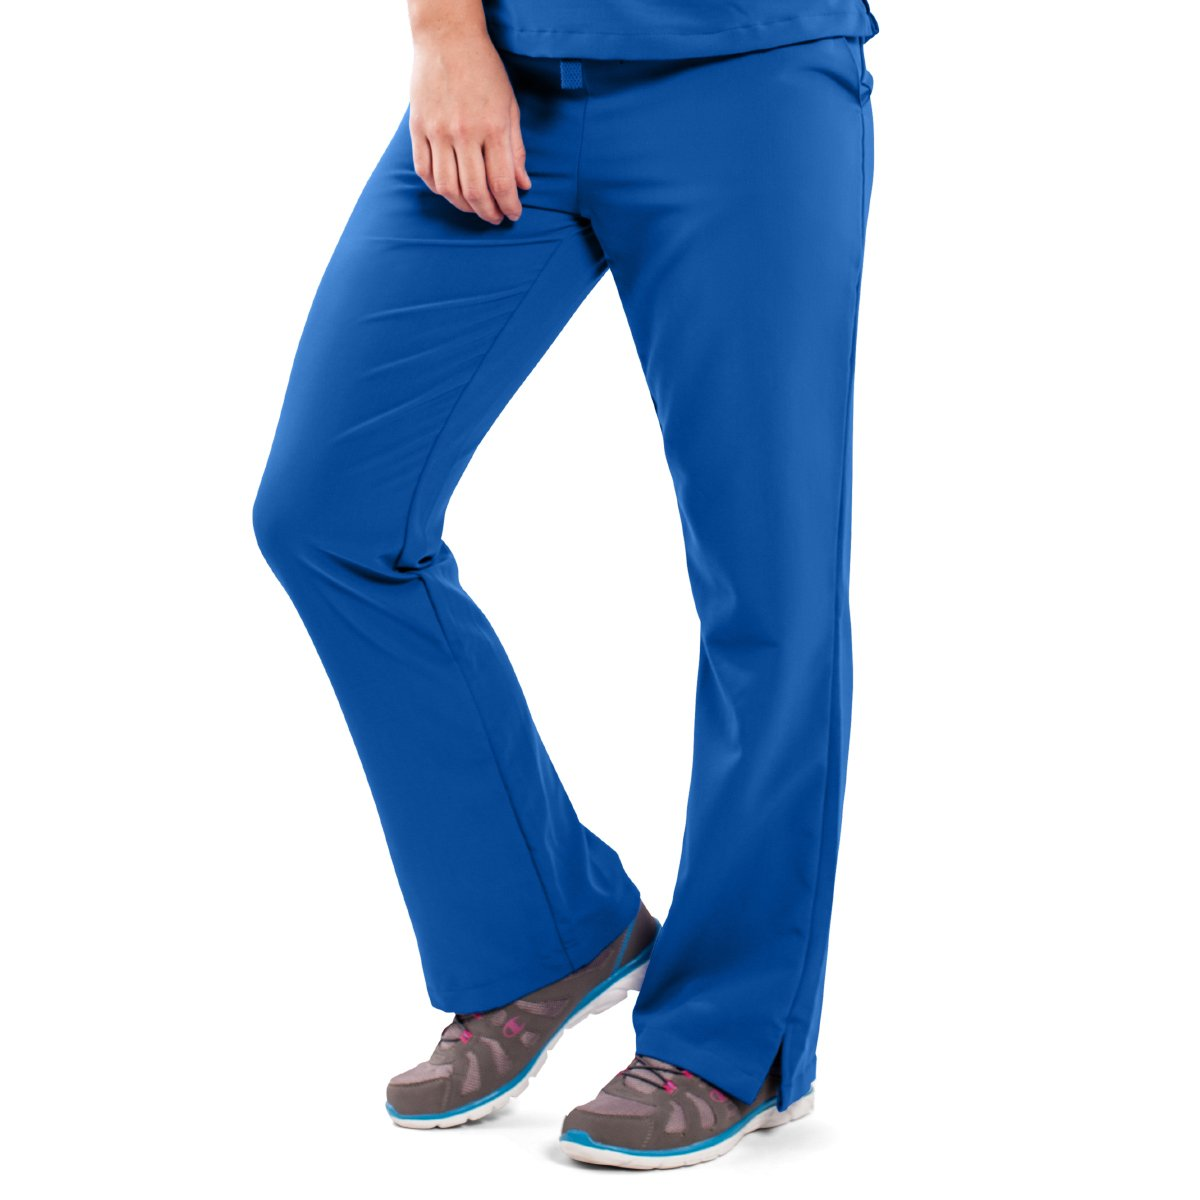 ave Women's Medical Scrub Bootcut Melrose Style Ranking Sales TOP20 Pants